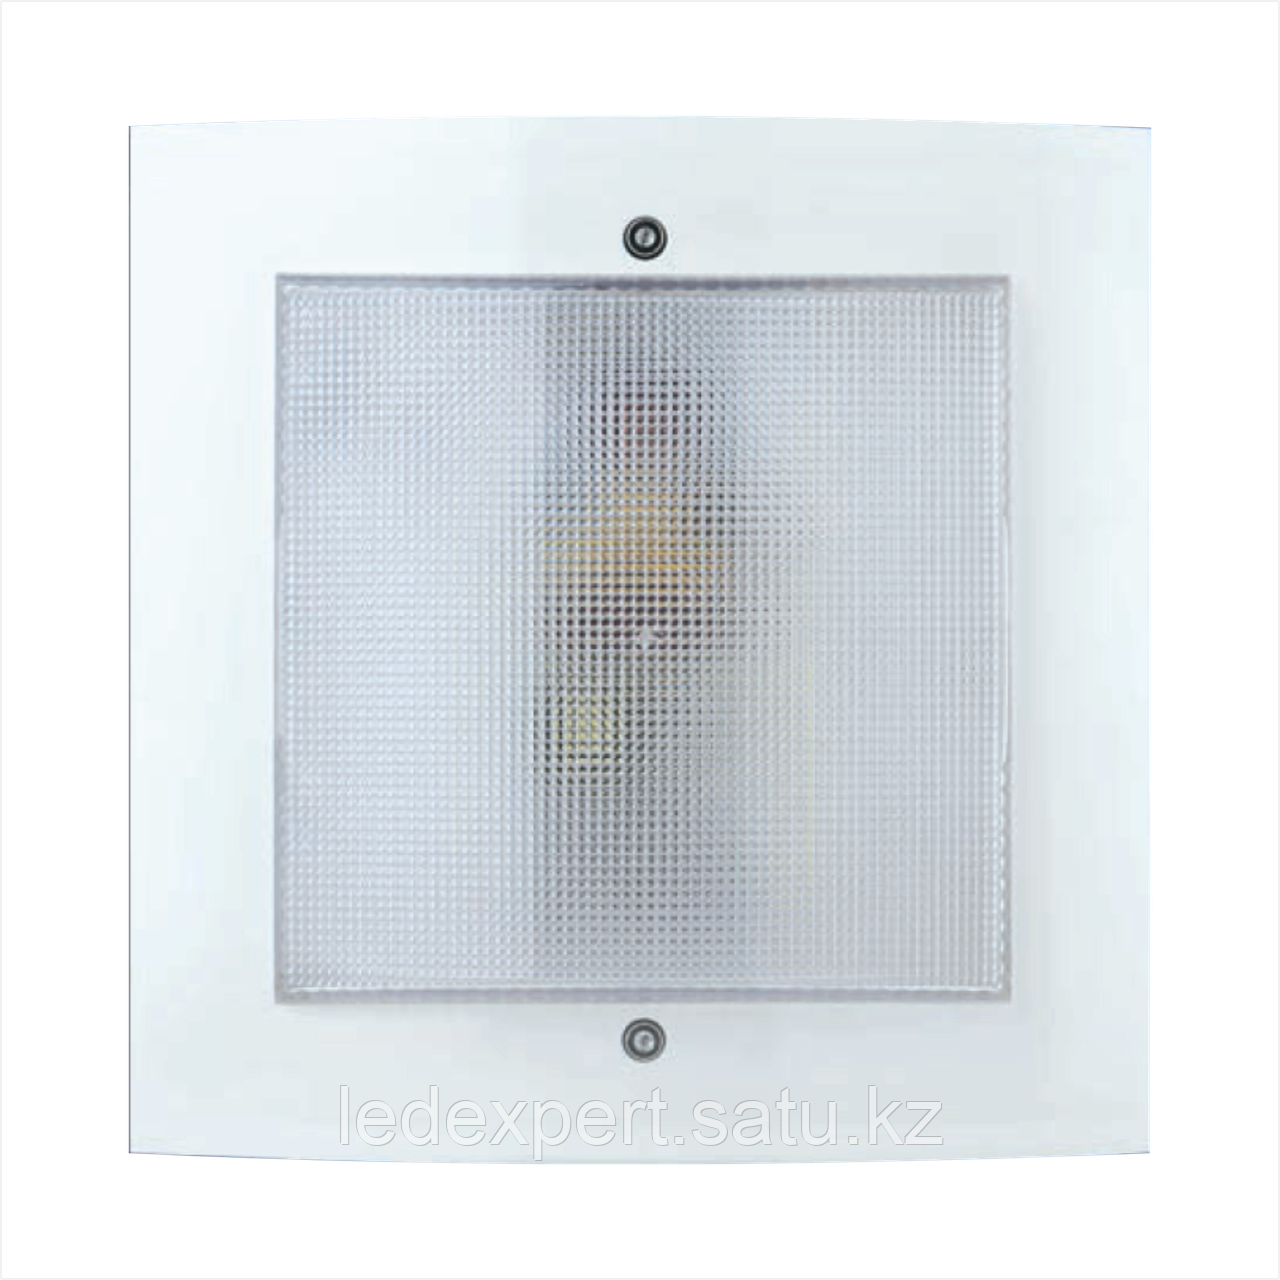 "Светильник дом. ДБП ""Стандарт-ЖКХ"" LED, 8Вт, антивандальный"